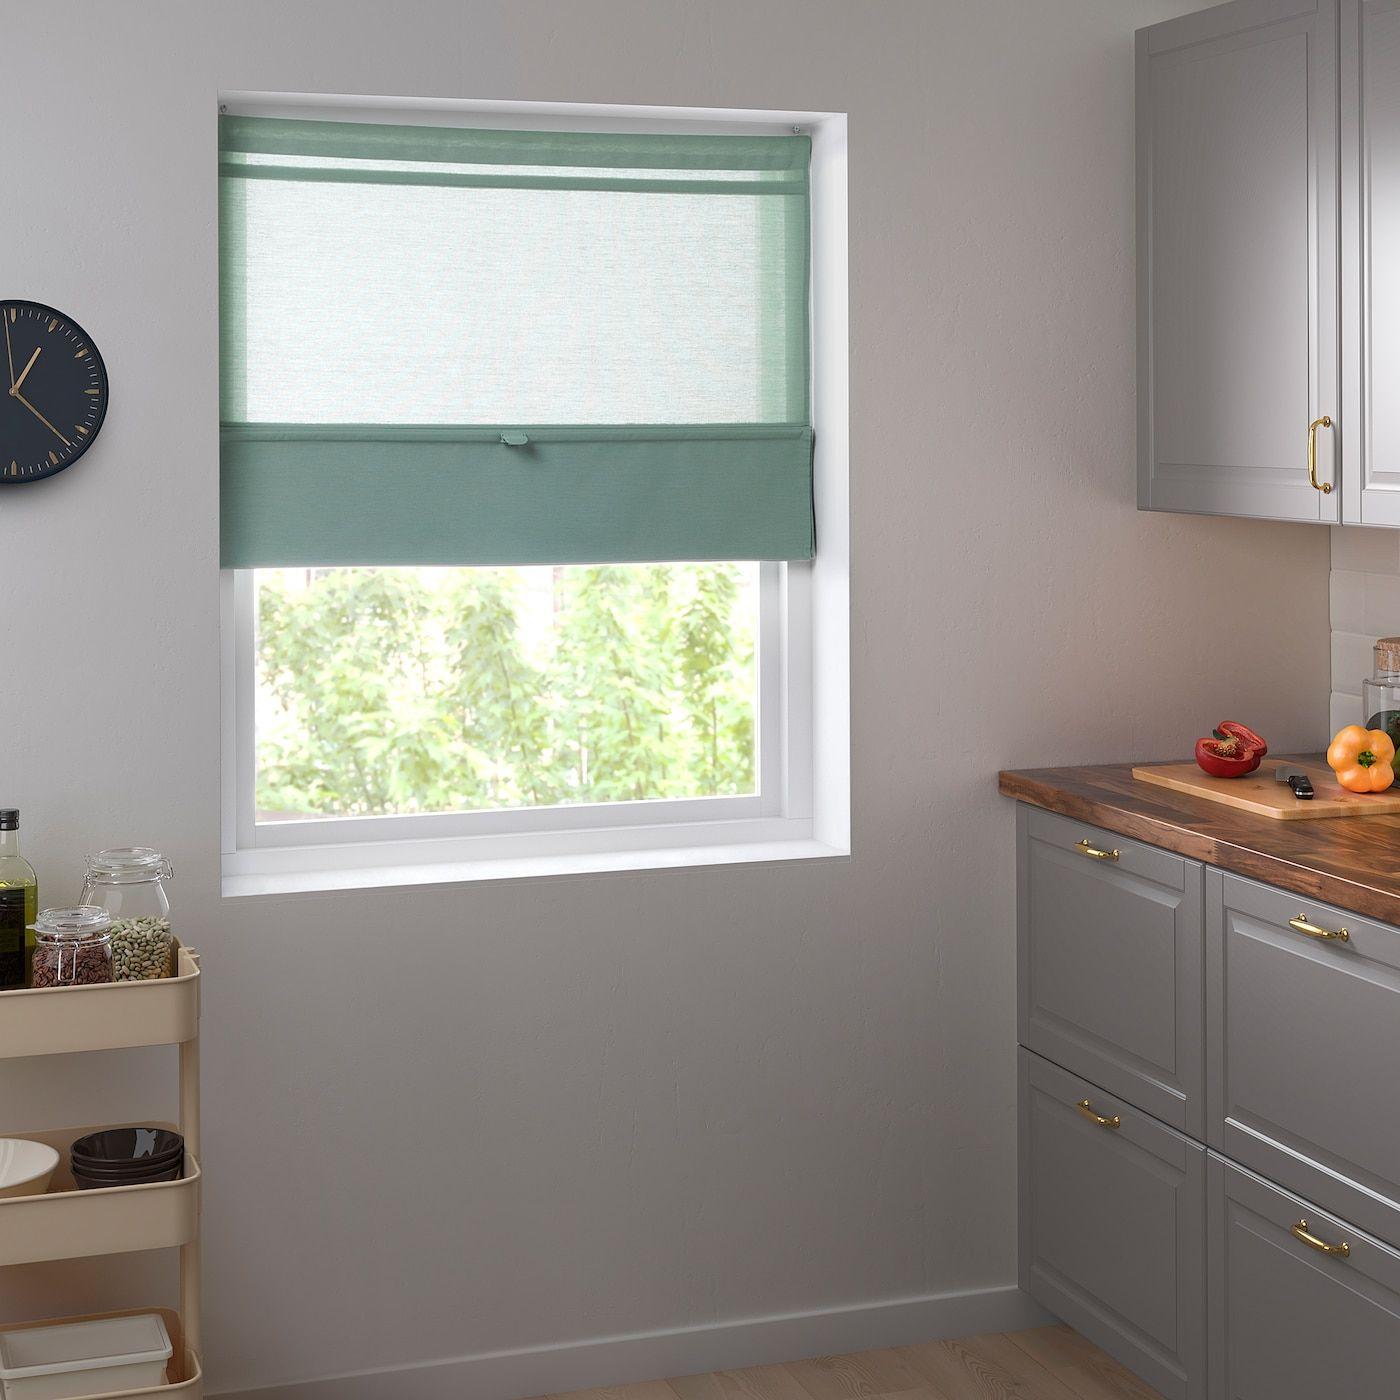 Full Size of Ringblomma Faltrollo Grn In 2020 Fenster Jalousien Innen Betten Ikea 160x200 Sofa Mit Schlaffunktion Bei Küche Kaufen Modulküche Miniküche Kosten Wohnzimmer Jalousien Ikea